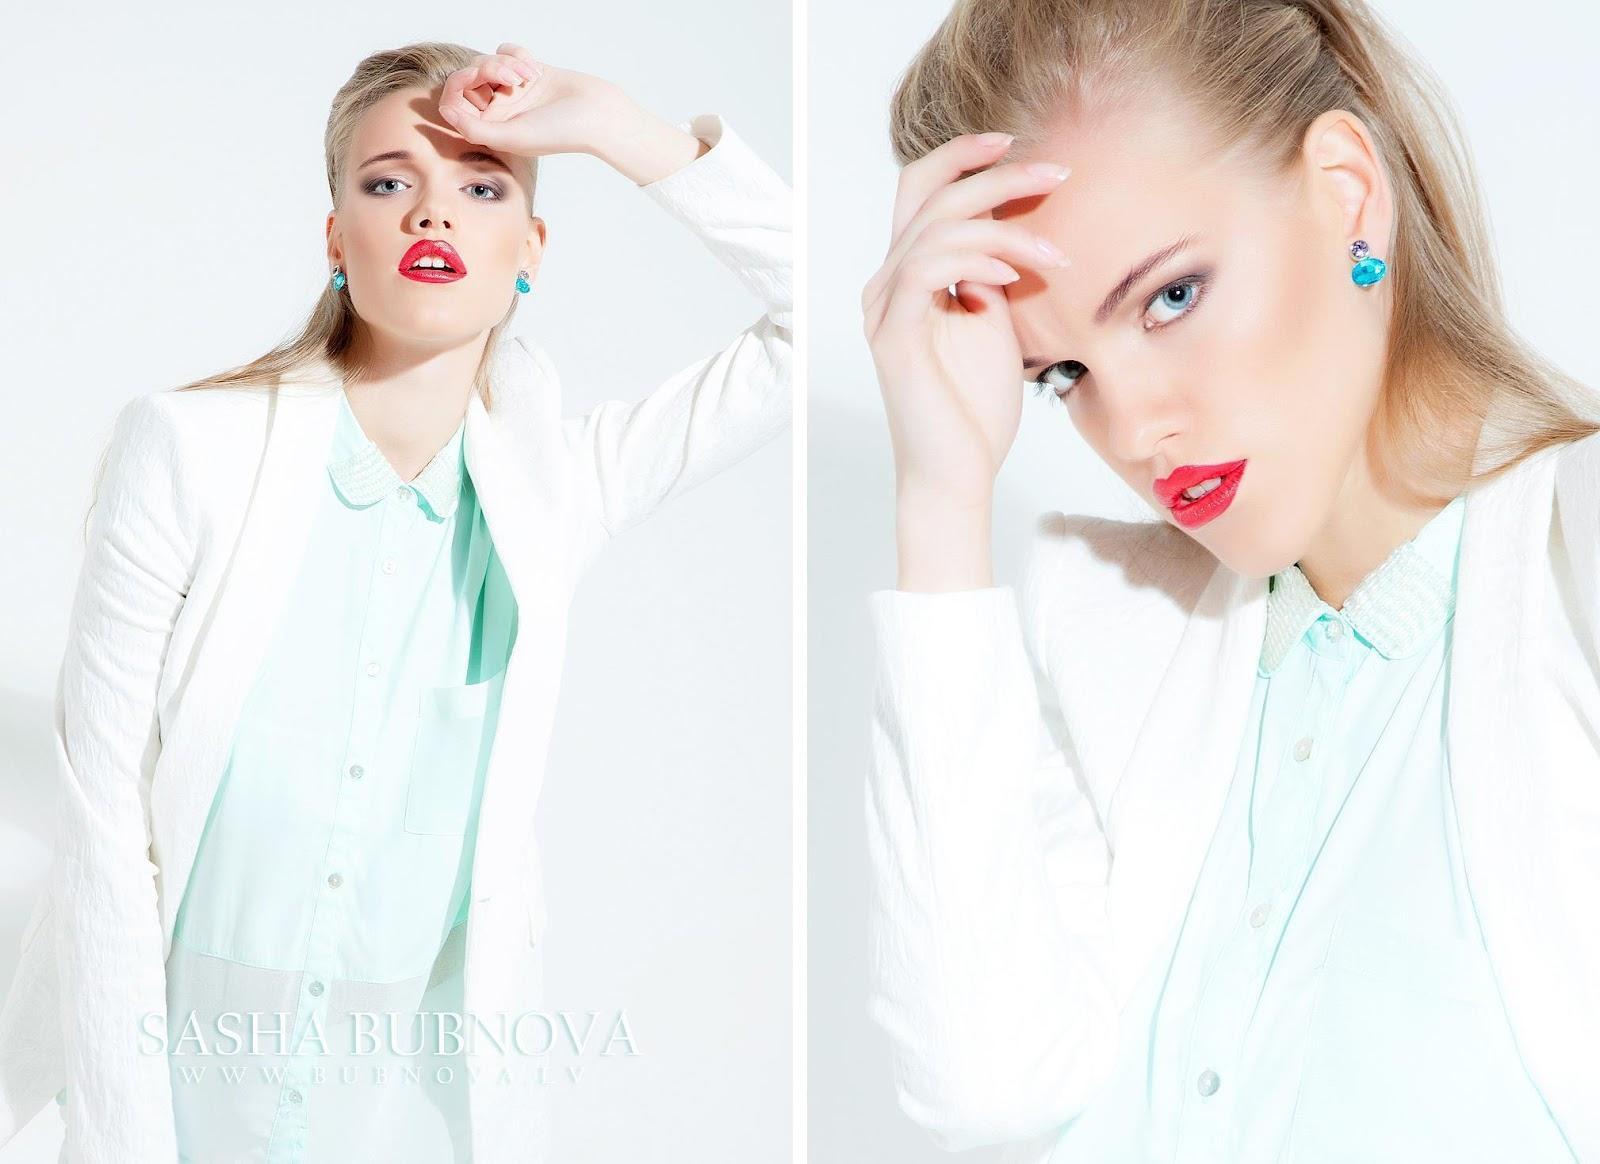 Fashion Photography by Aleksandra Bubnova